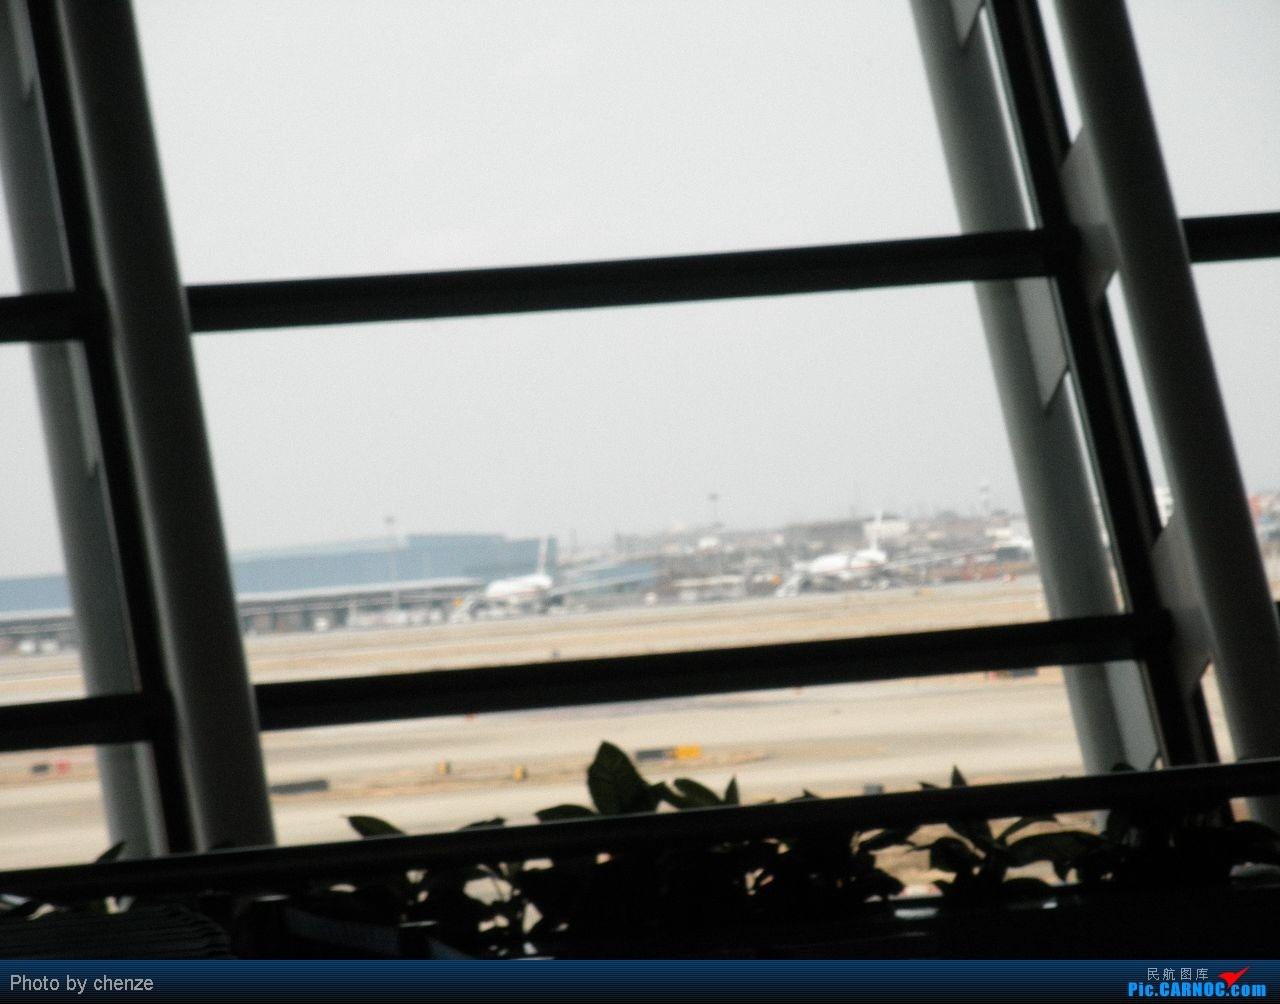 Re:[原创]春节回家探亲,奉上些烂图,笑纳!!PVG-SHE-PVG    中国上海浦东机场